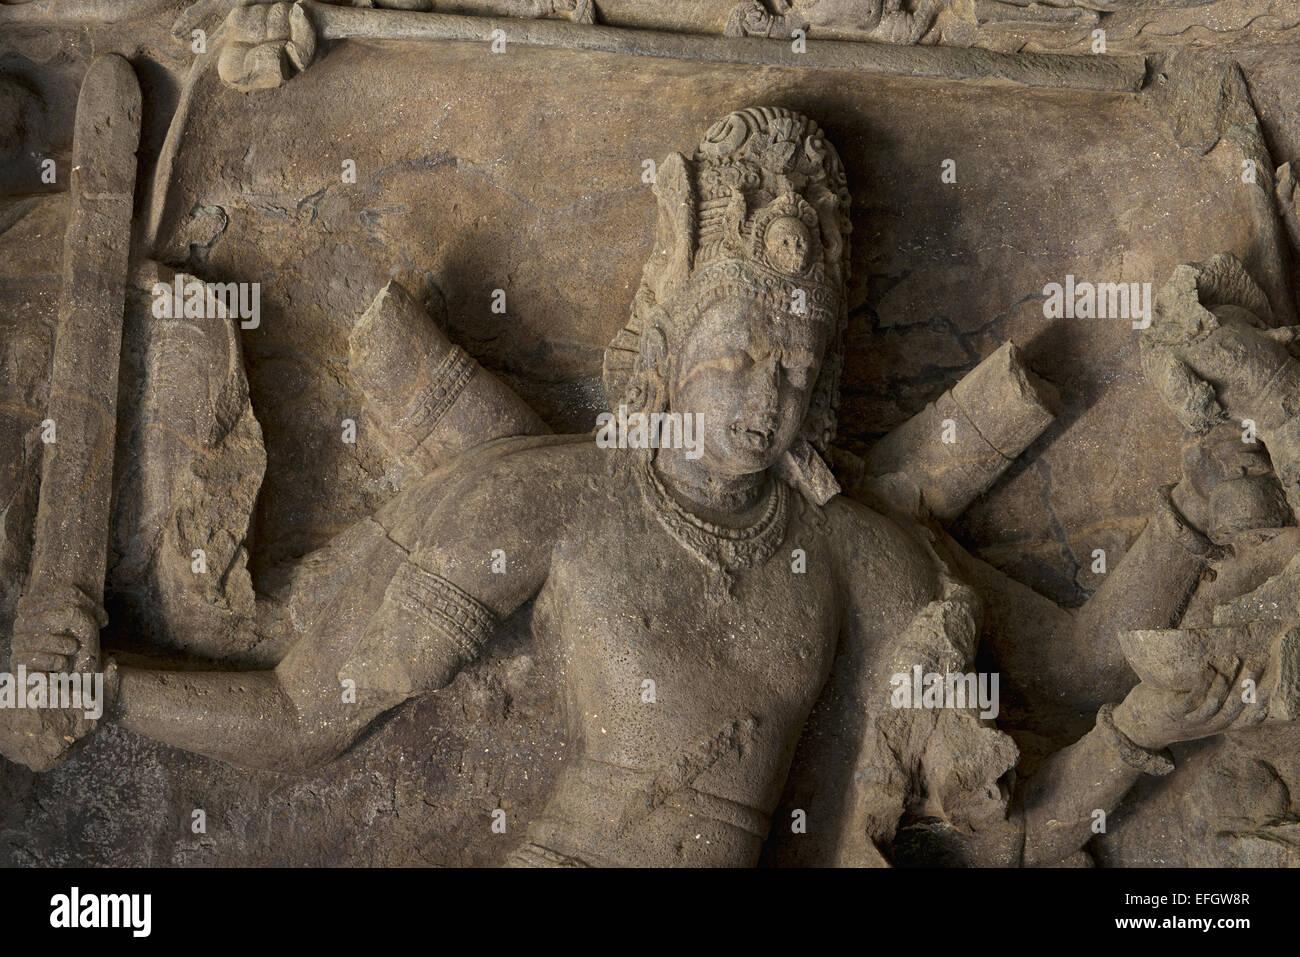 La grotte 1 Andhakasura-vadha-murti. Plus près, grottes d'Elephanta, Mumbai Inde Photo Stock